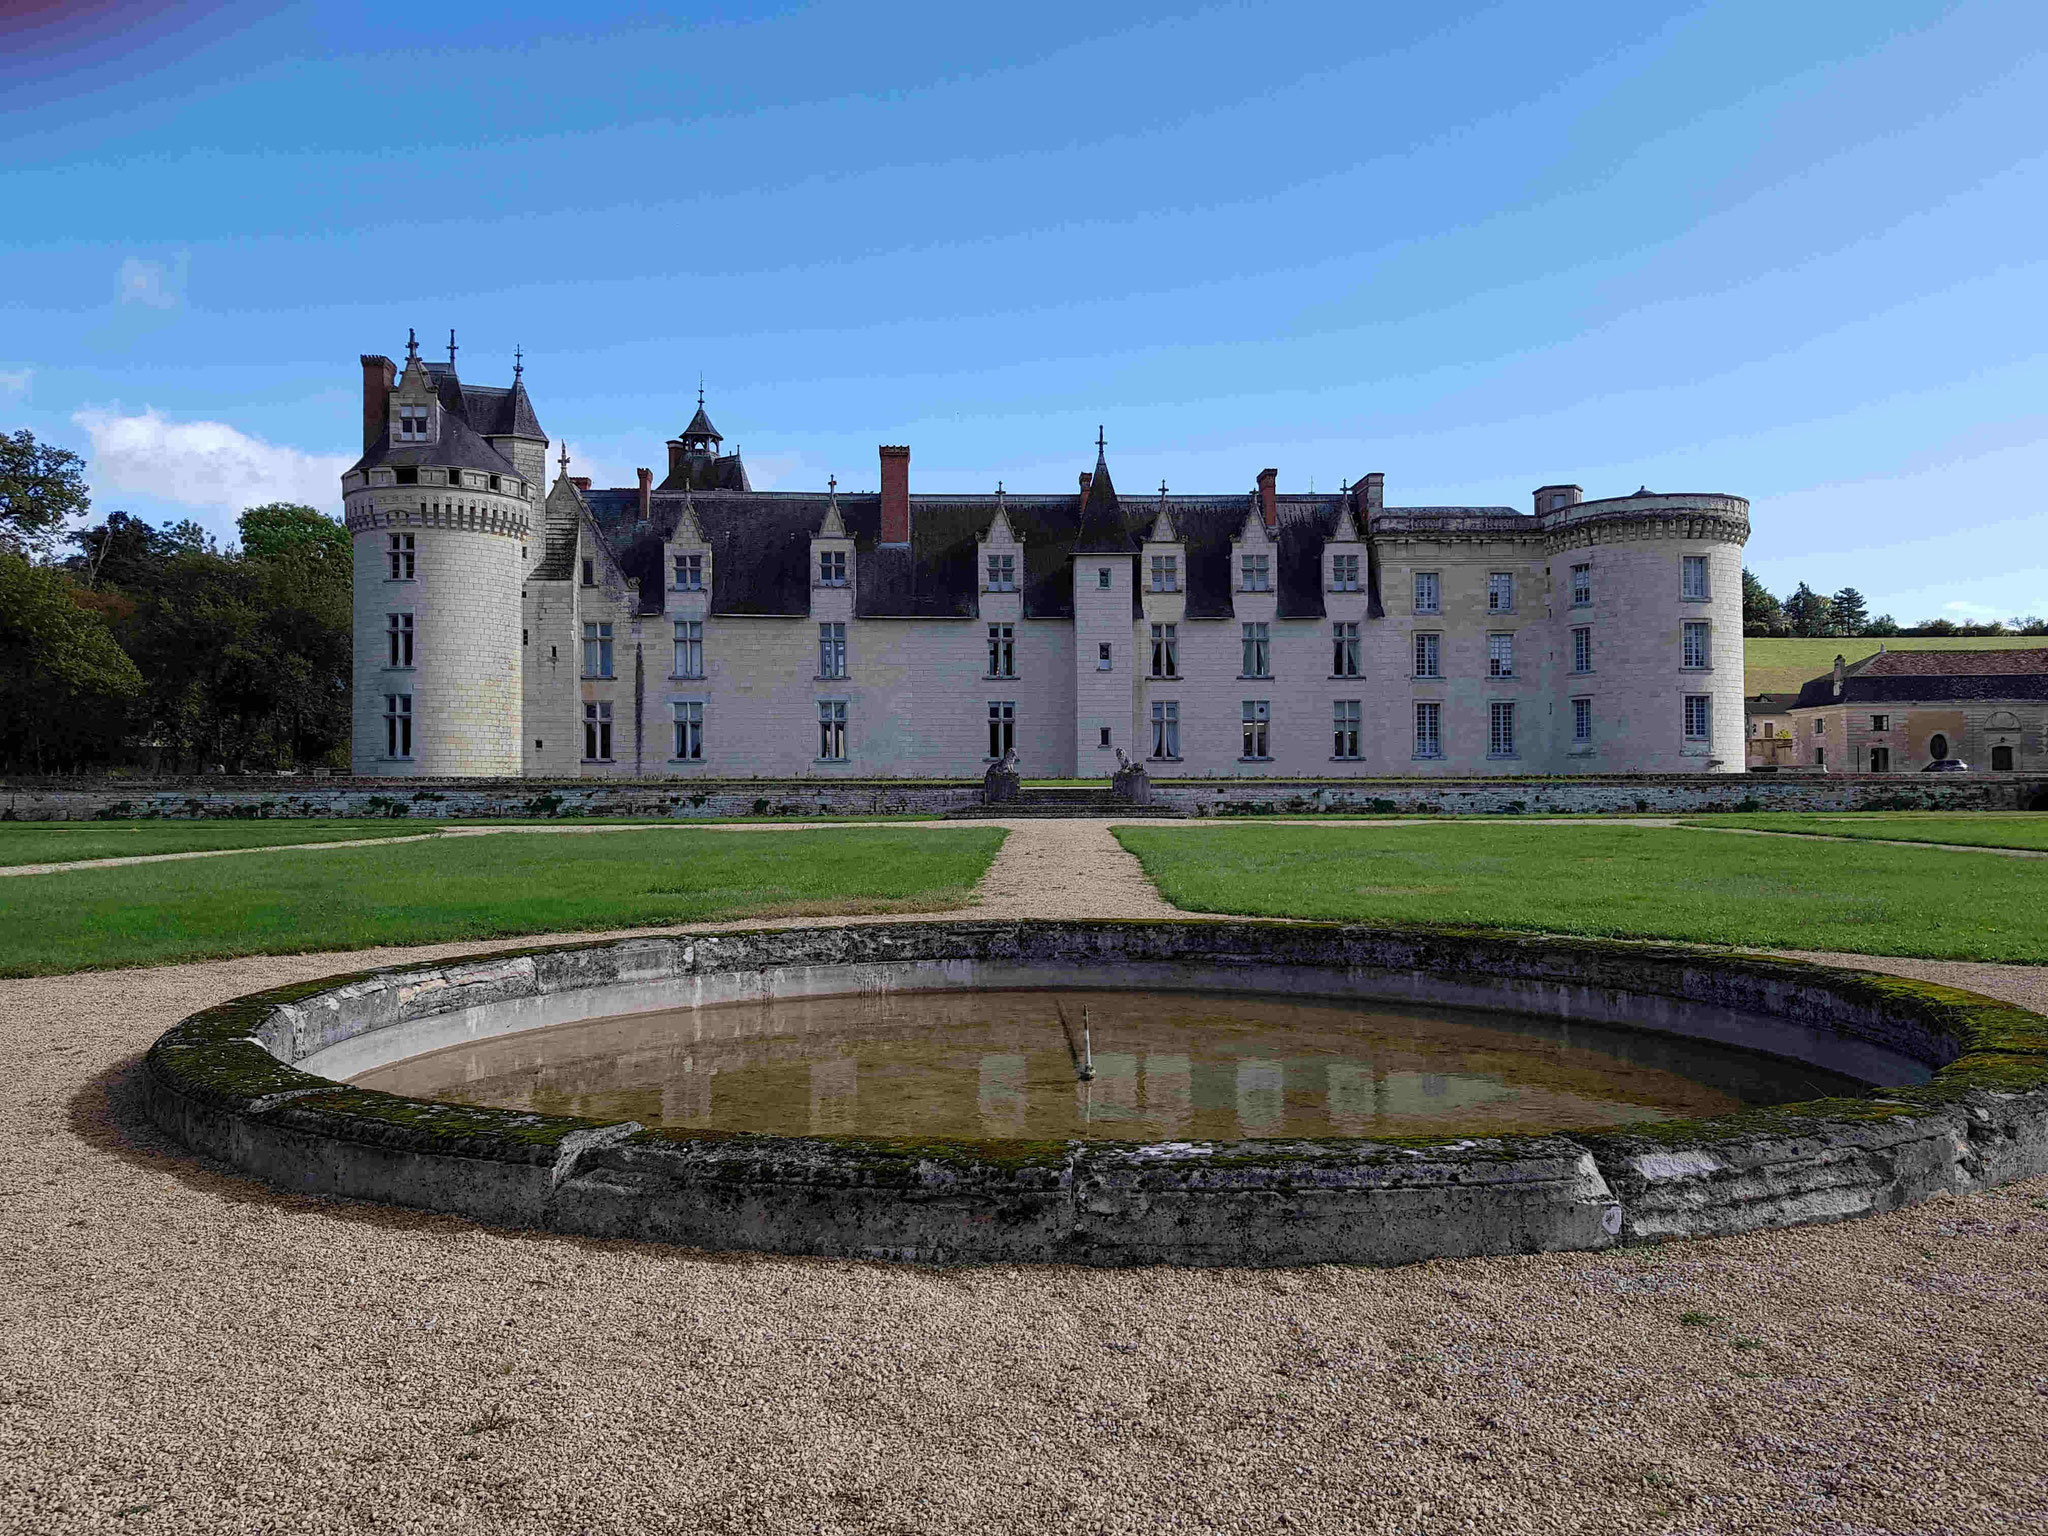 Le château de Dissay vu du jardin.